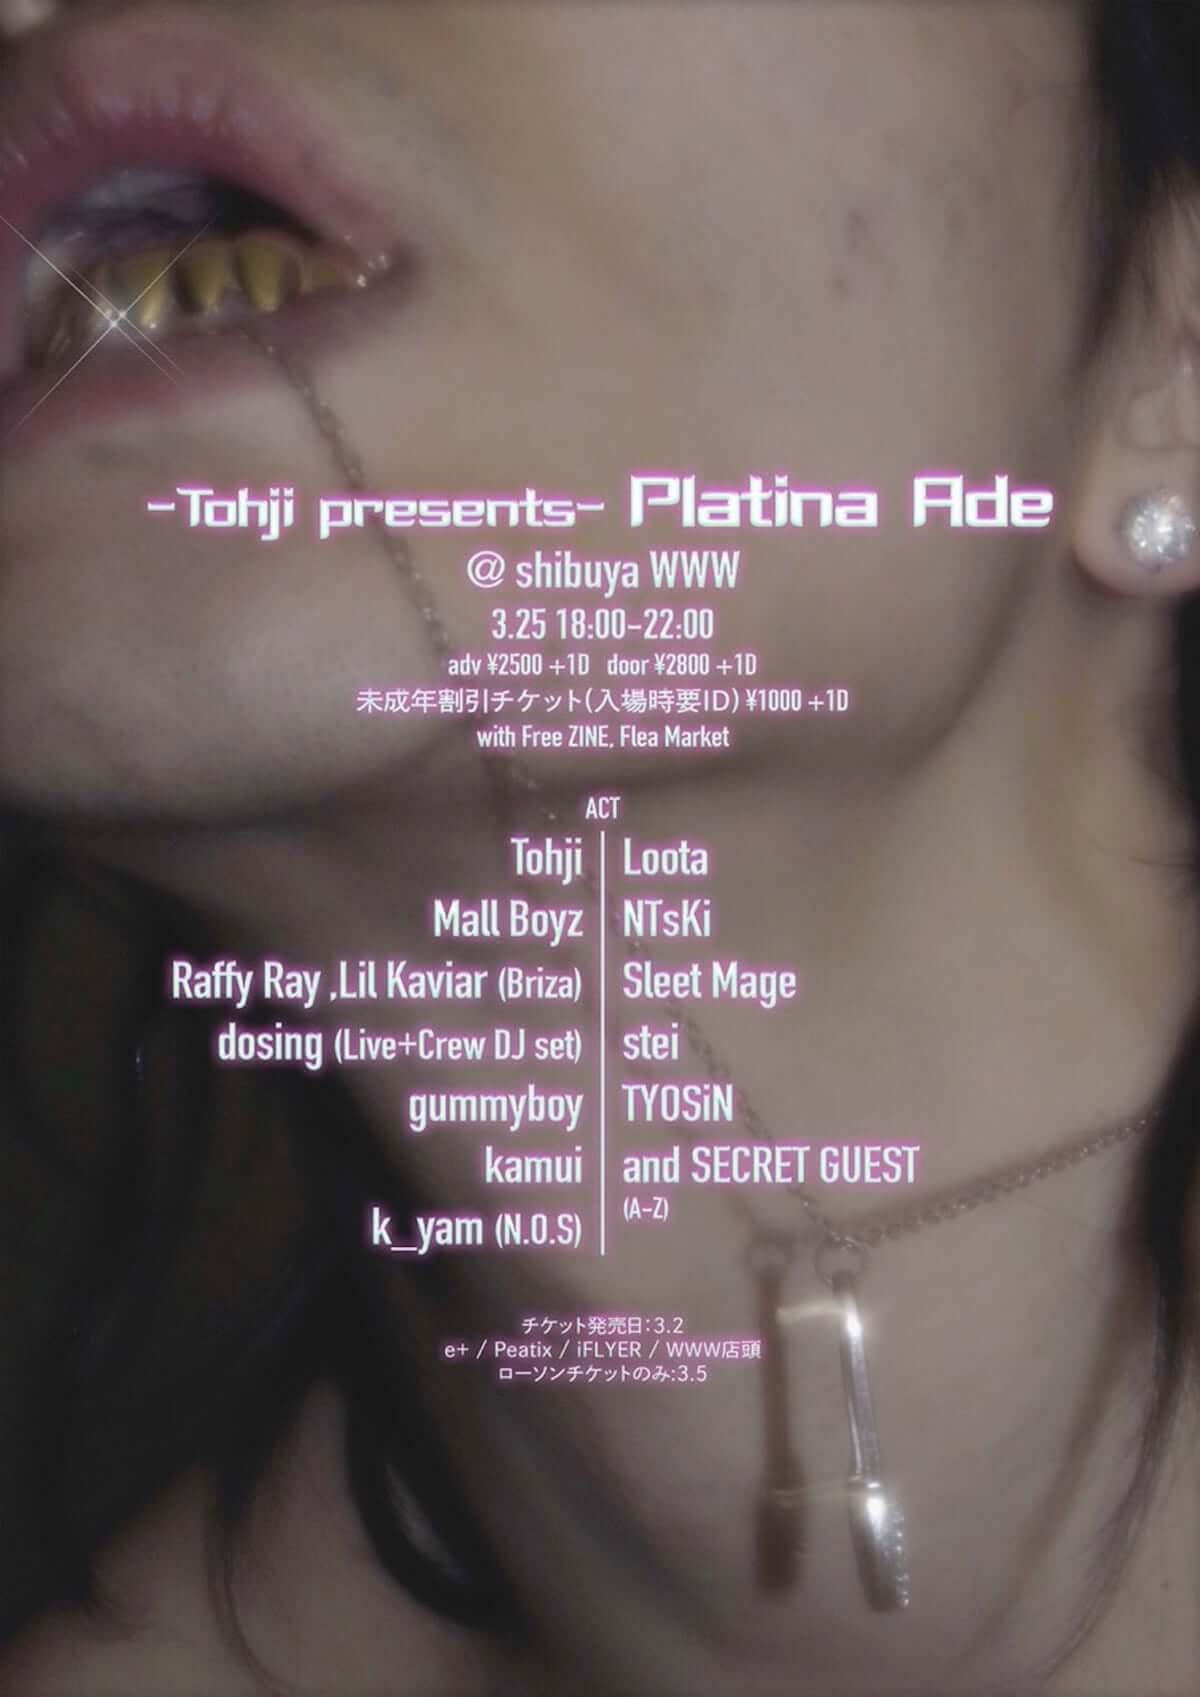 Tohji主催パーティー『Platina Ade』|追加発表にLoota music190318-tohji-loota-1-1200x1697